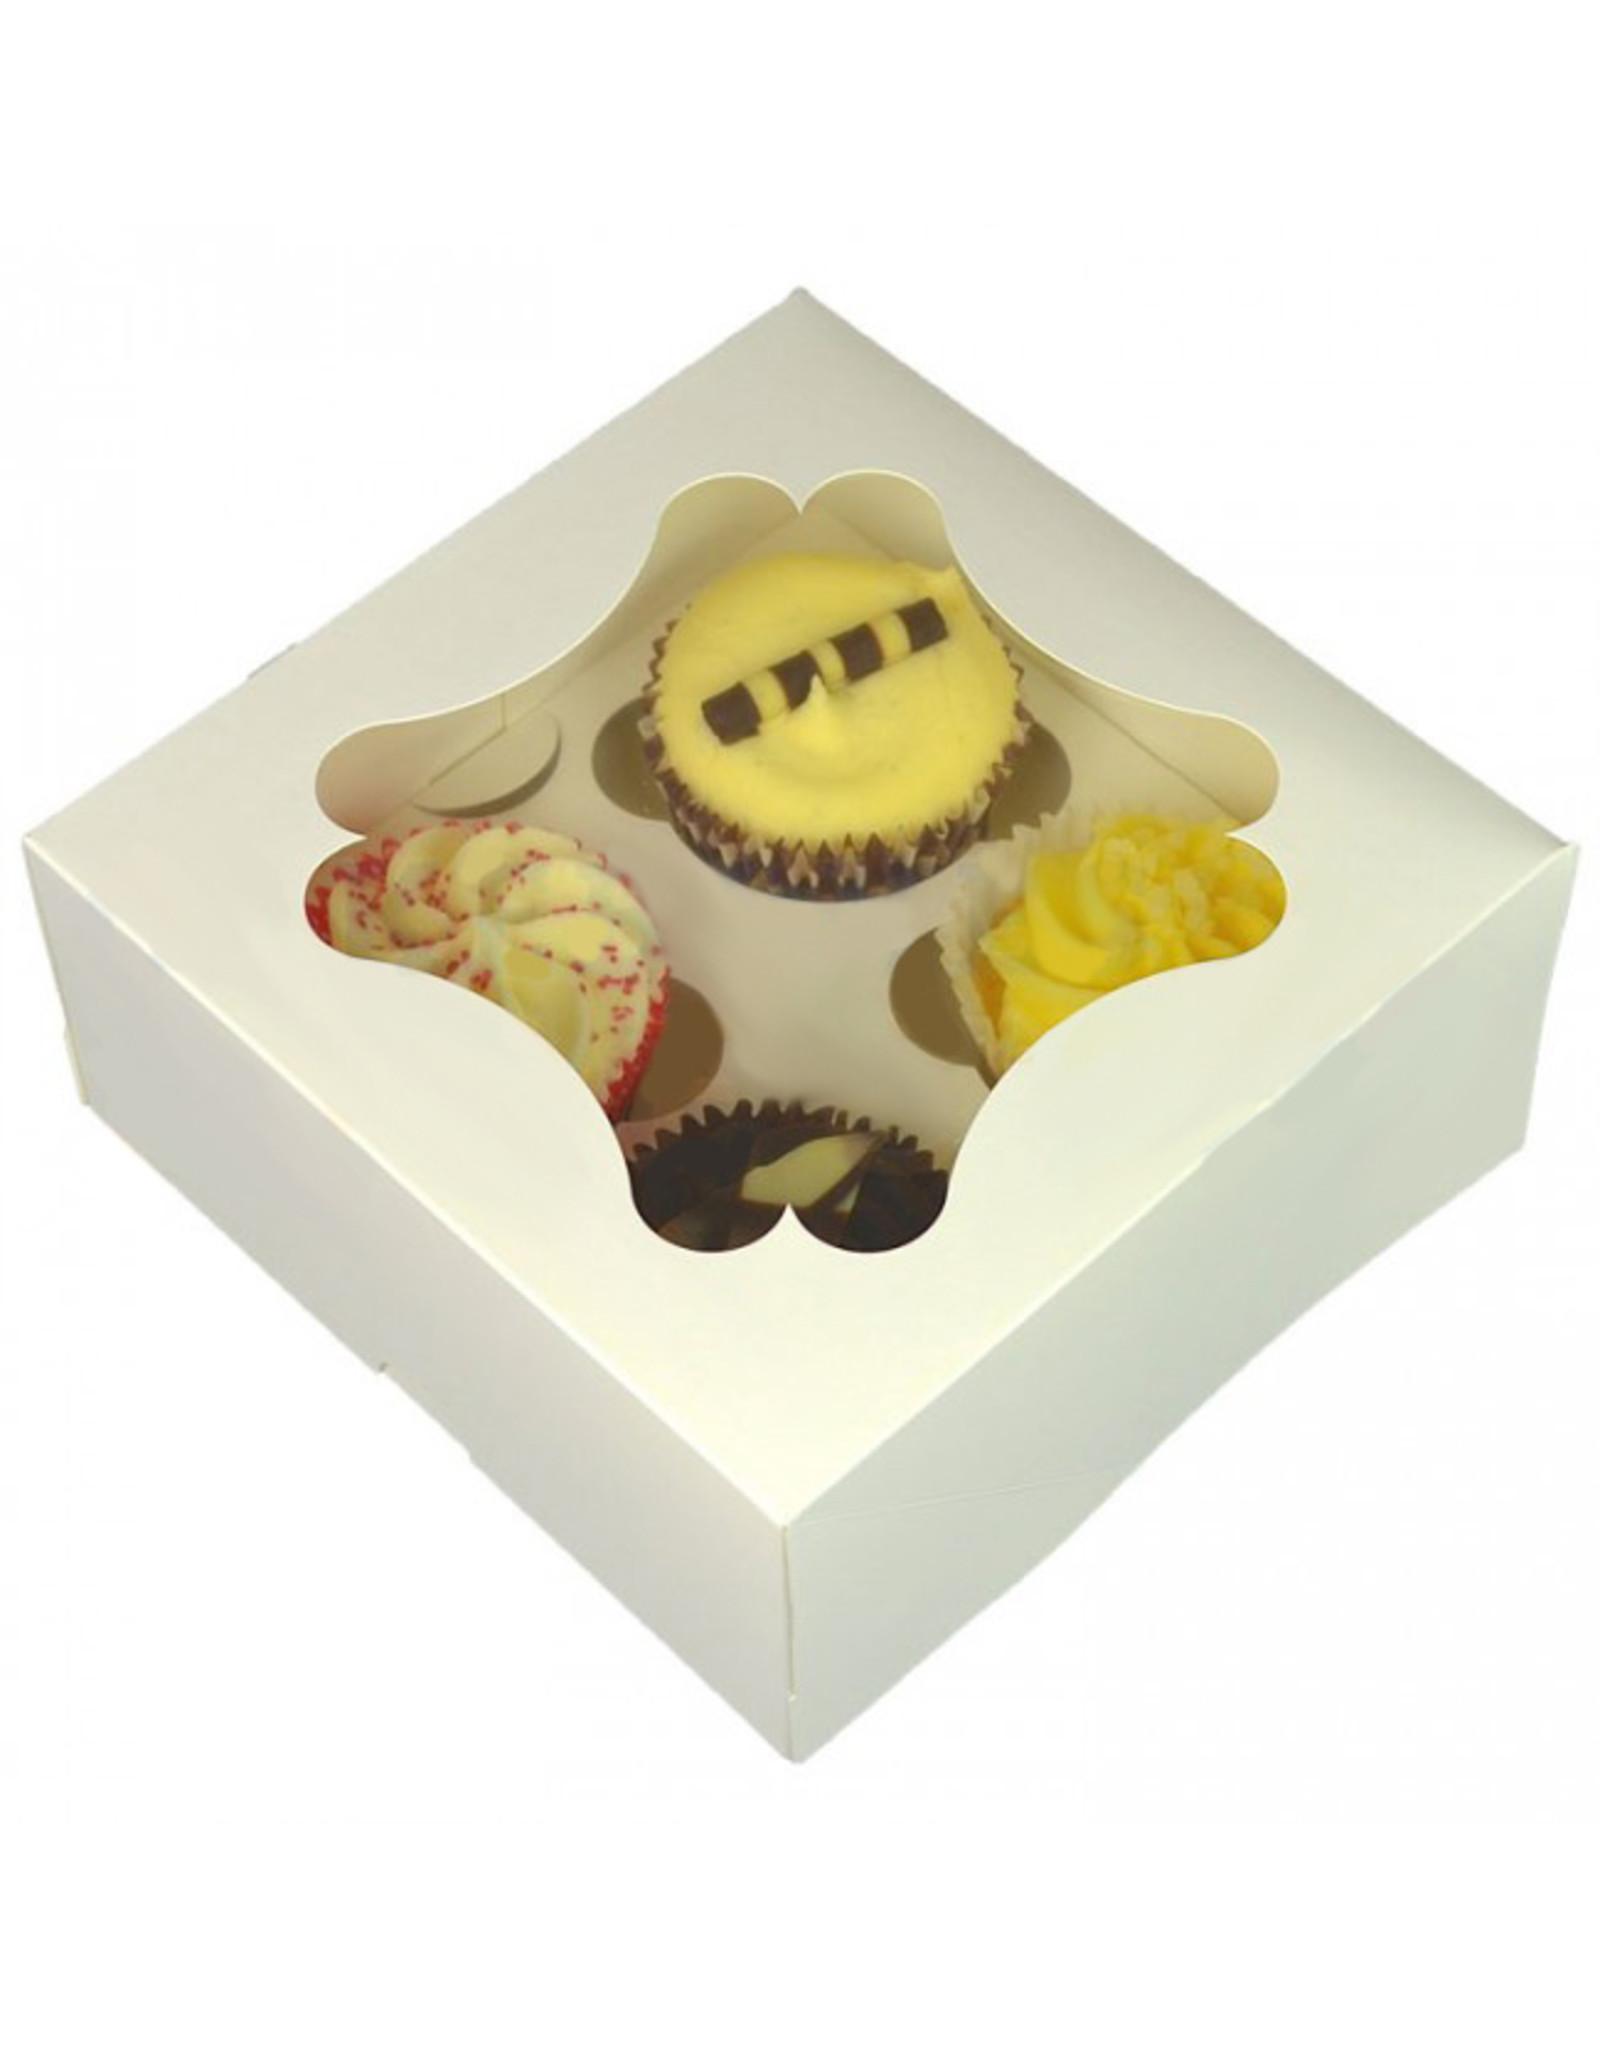 Budget box for 4 cupcakes (per 25 pcs)